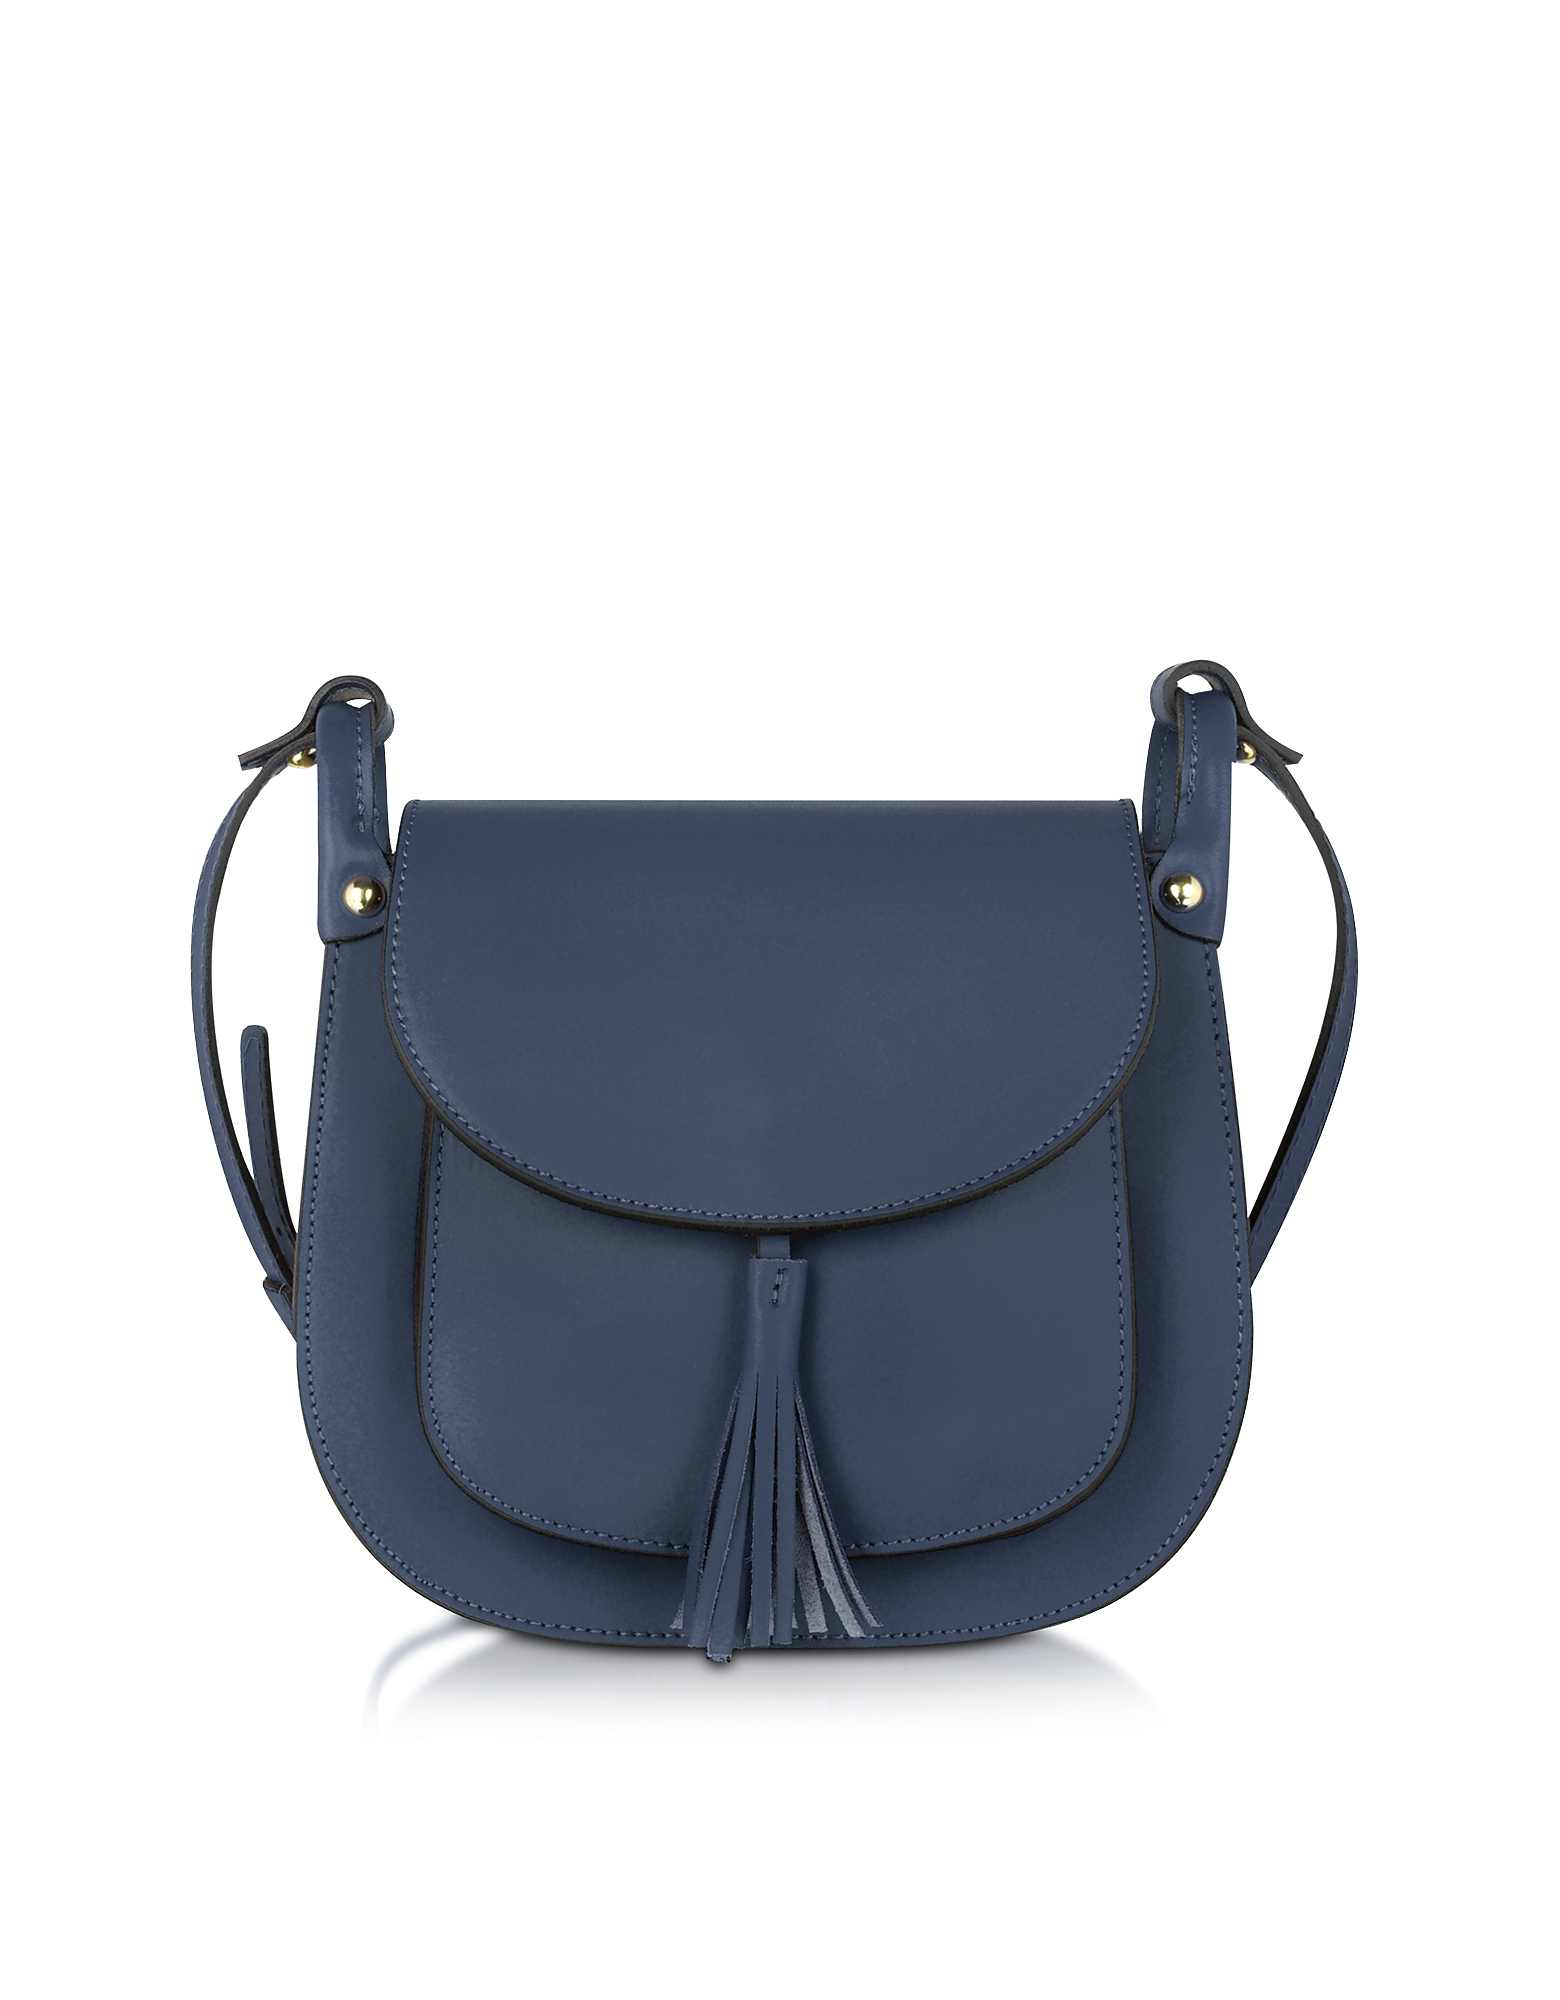 Le Parmentier Handbags, Buttercup Navy Leather Crossbody Bag